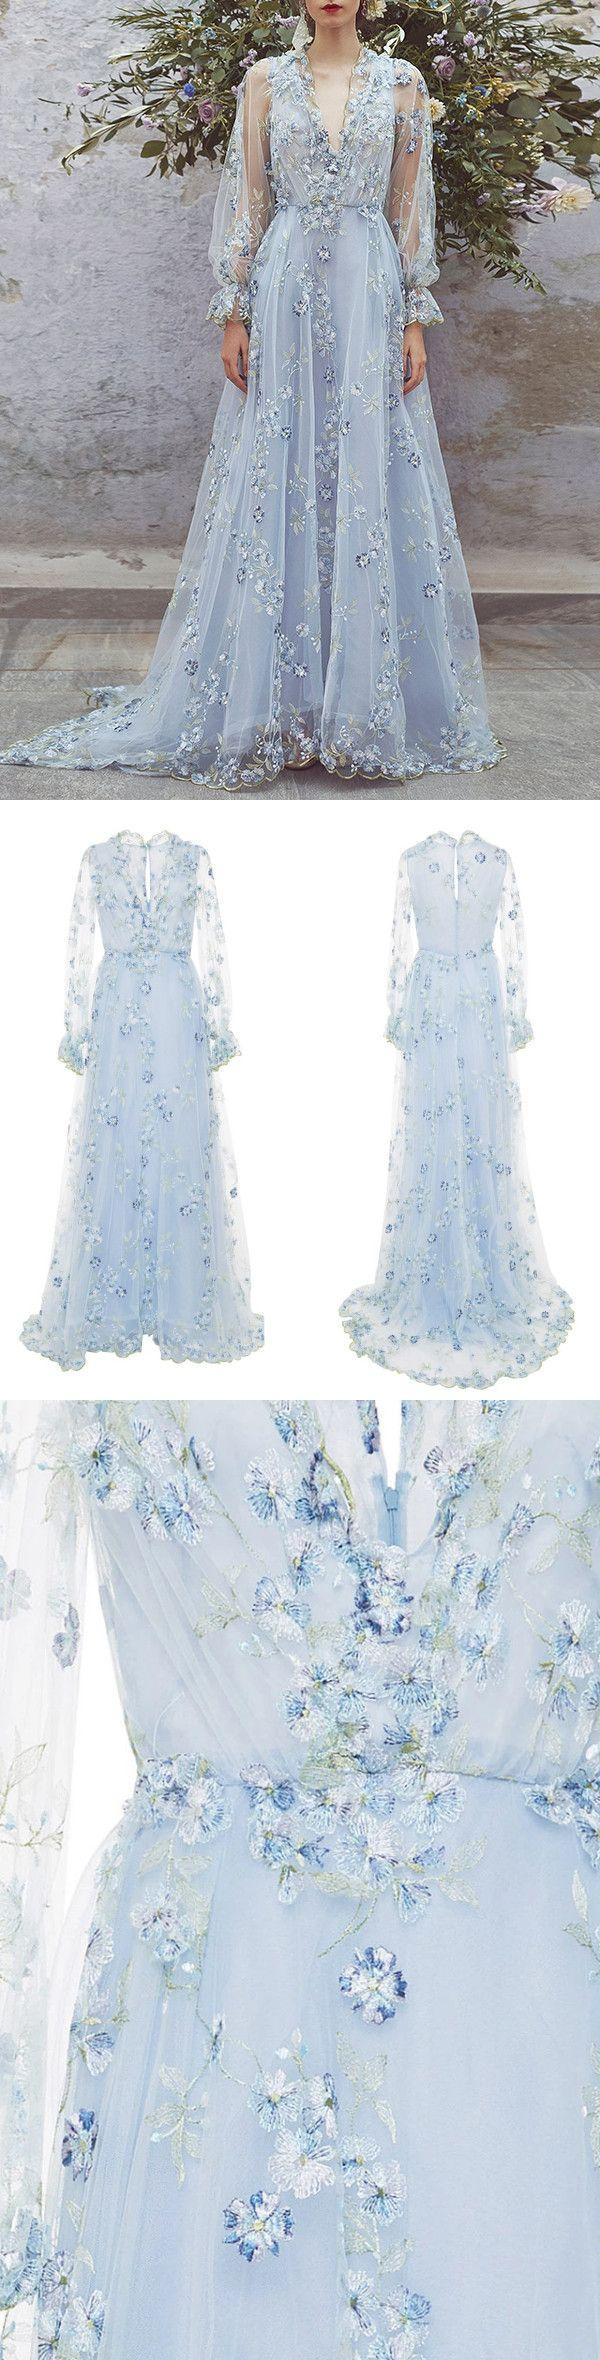 lace v neck prom dress floral long prom dress vb african